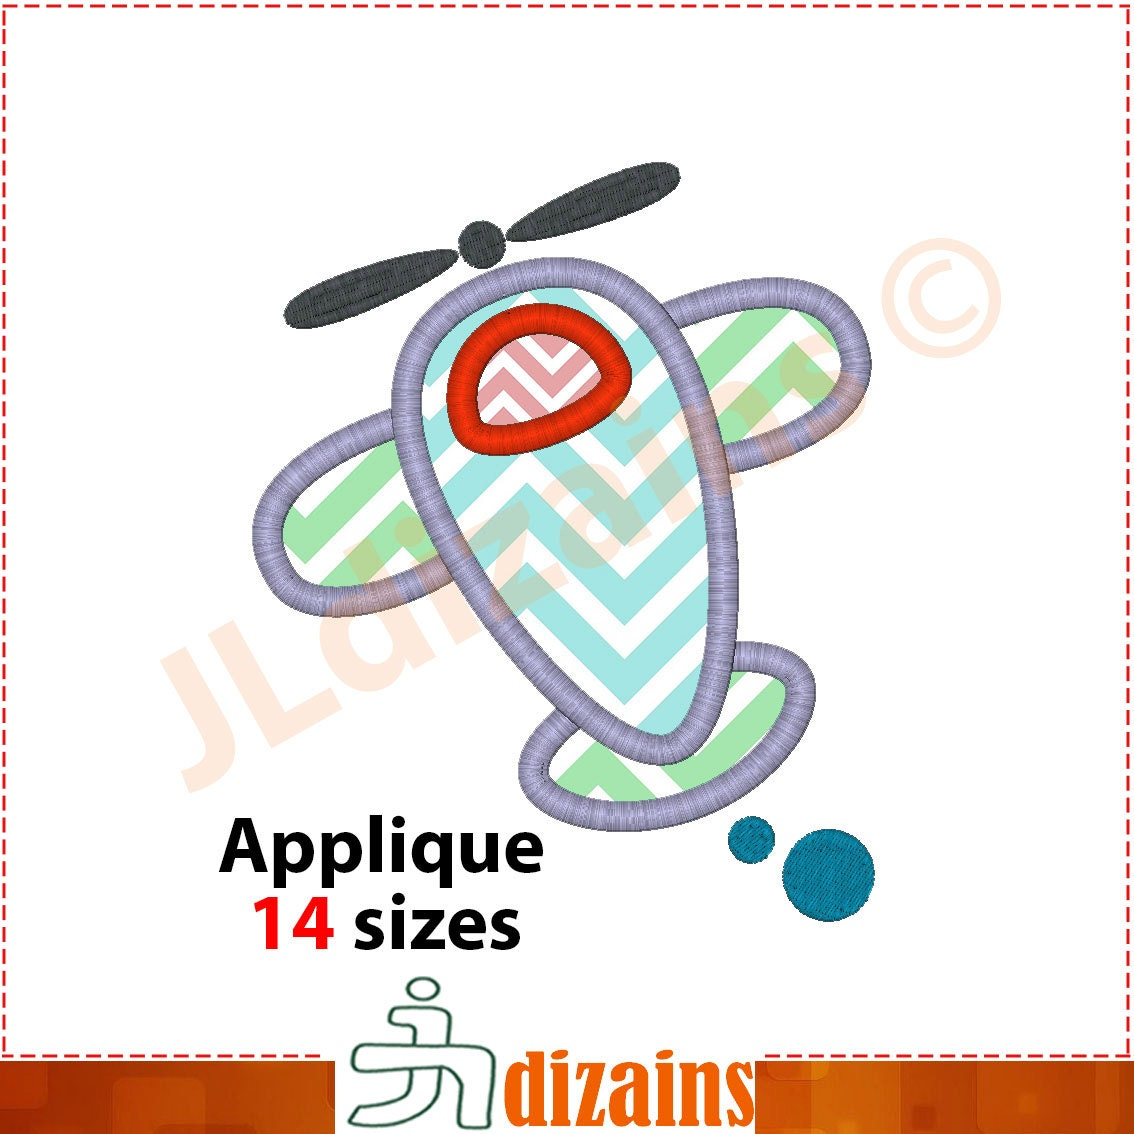 airplane applique design machine embroidery design. Black Bedroom Furniture Sets. Home Design Ideas